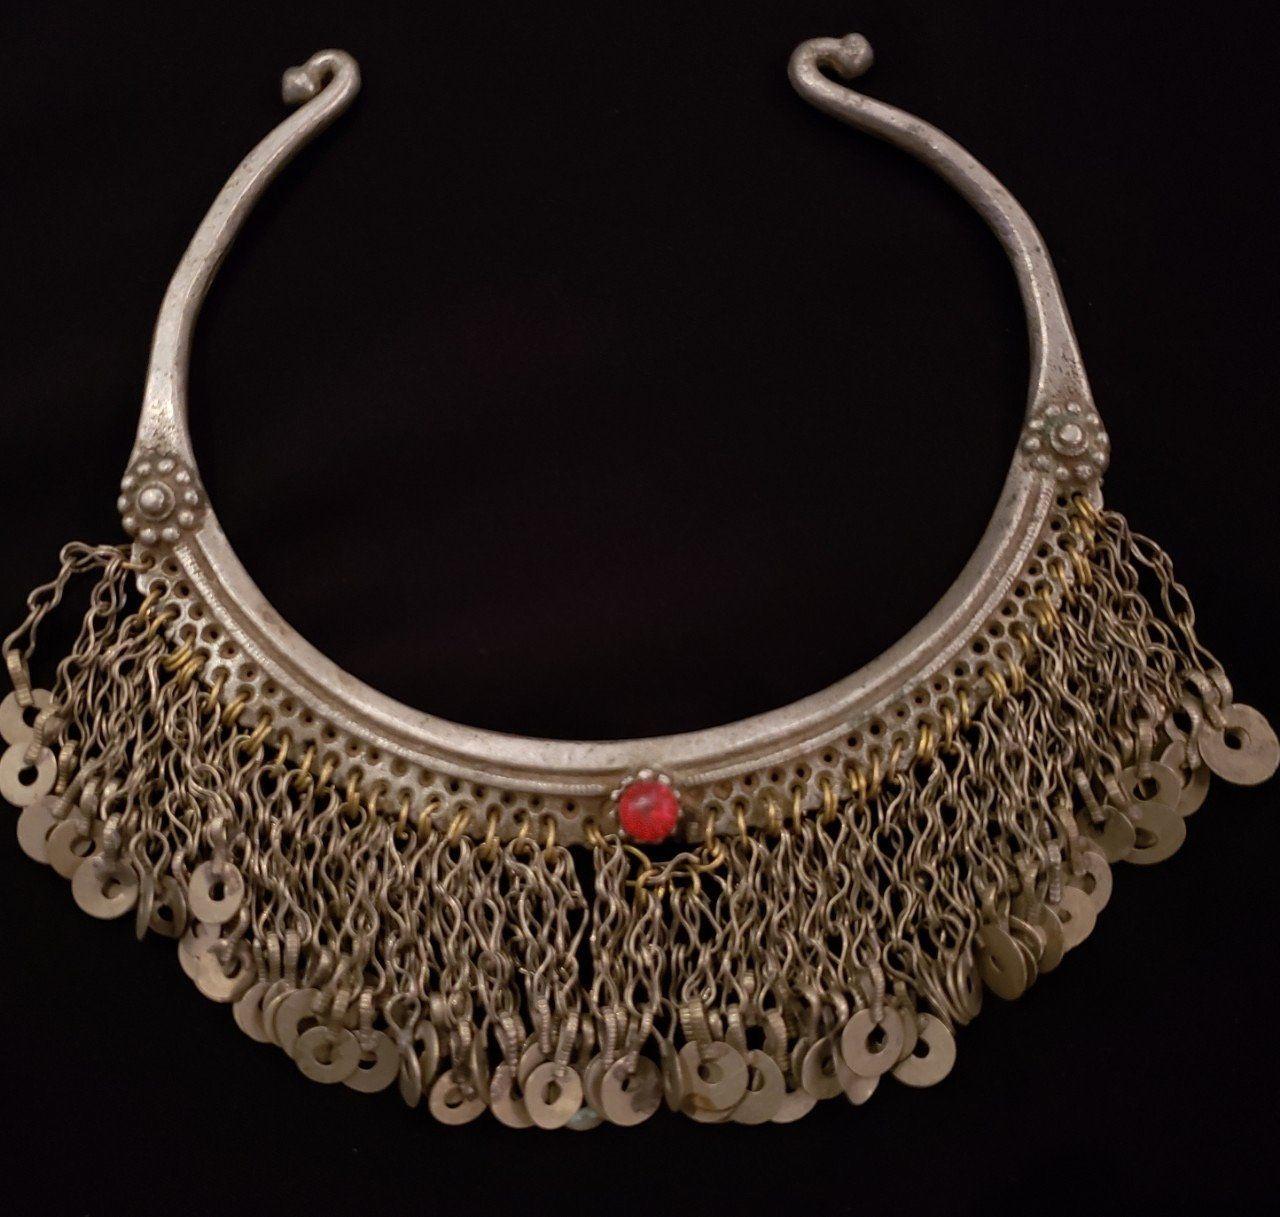 Kuchi Torque-Kuchi Jewellery Exotic Kuchi Necklace-antique Torque-collectible necklace-Billy Dance Middle Eastern Neck Piece-Vintage